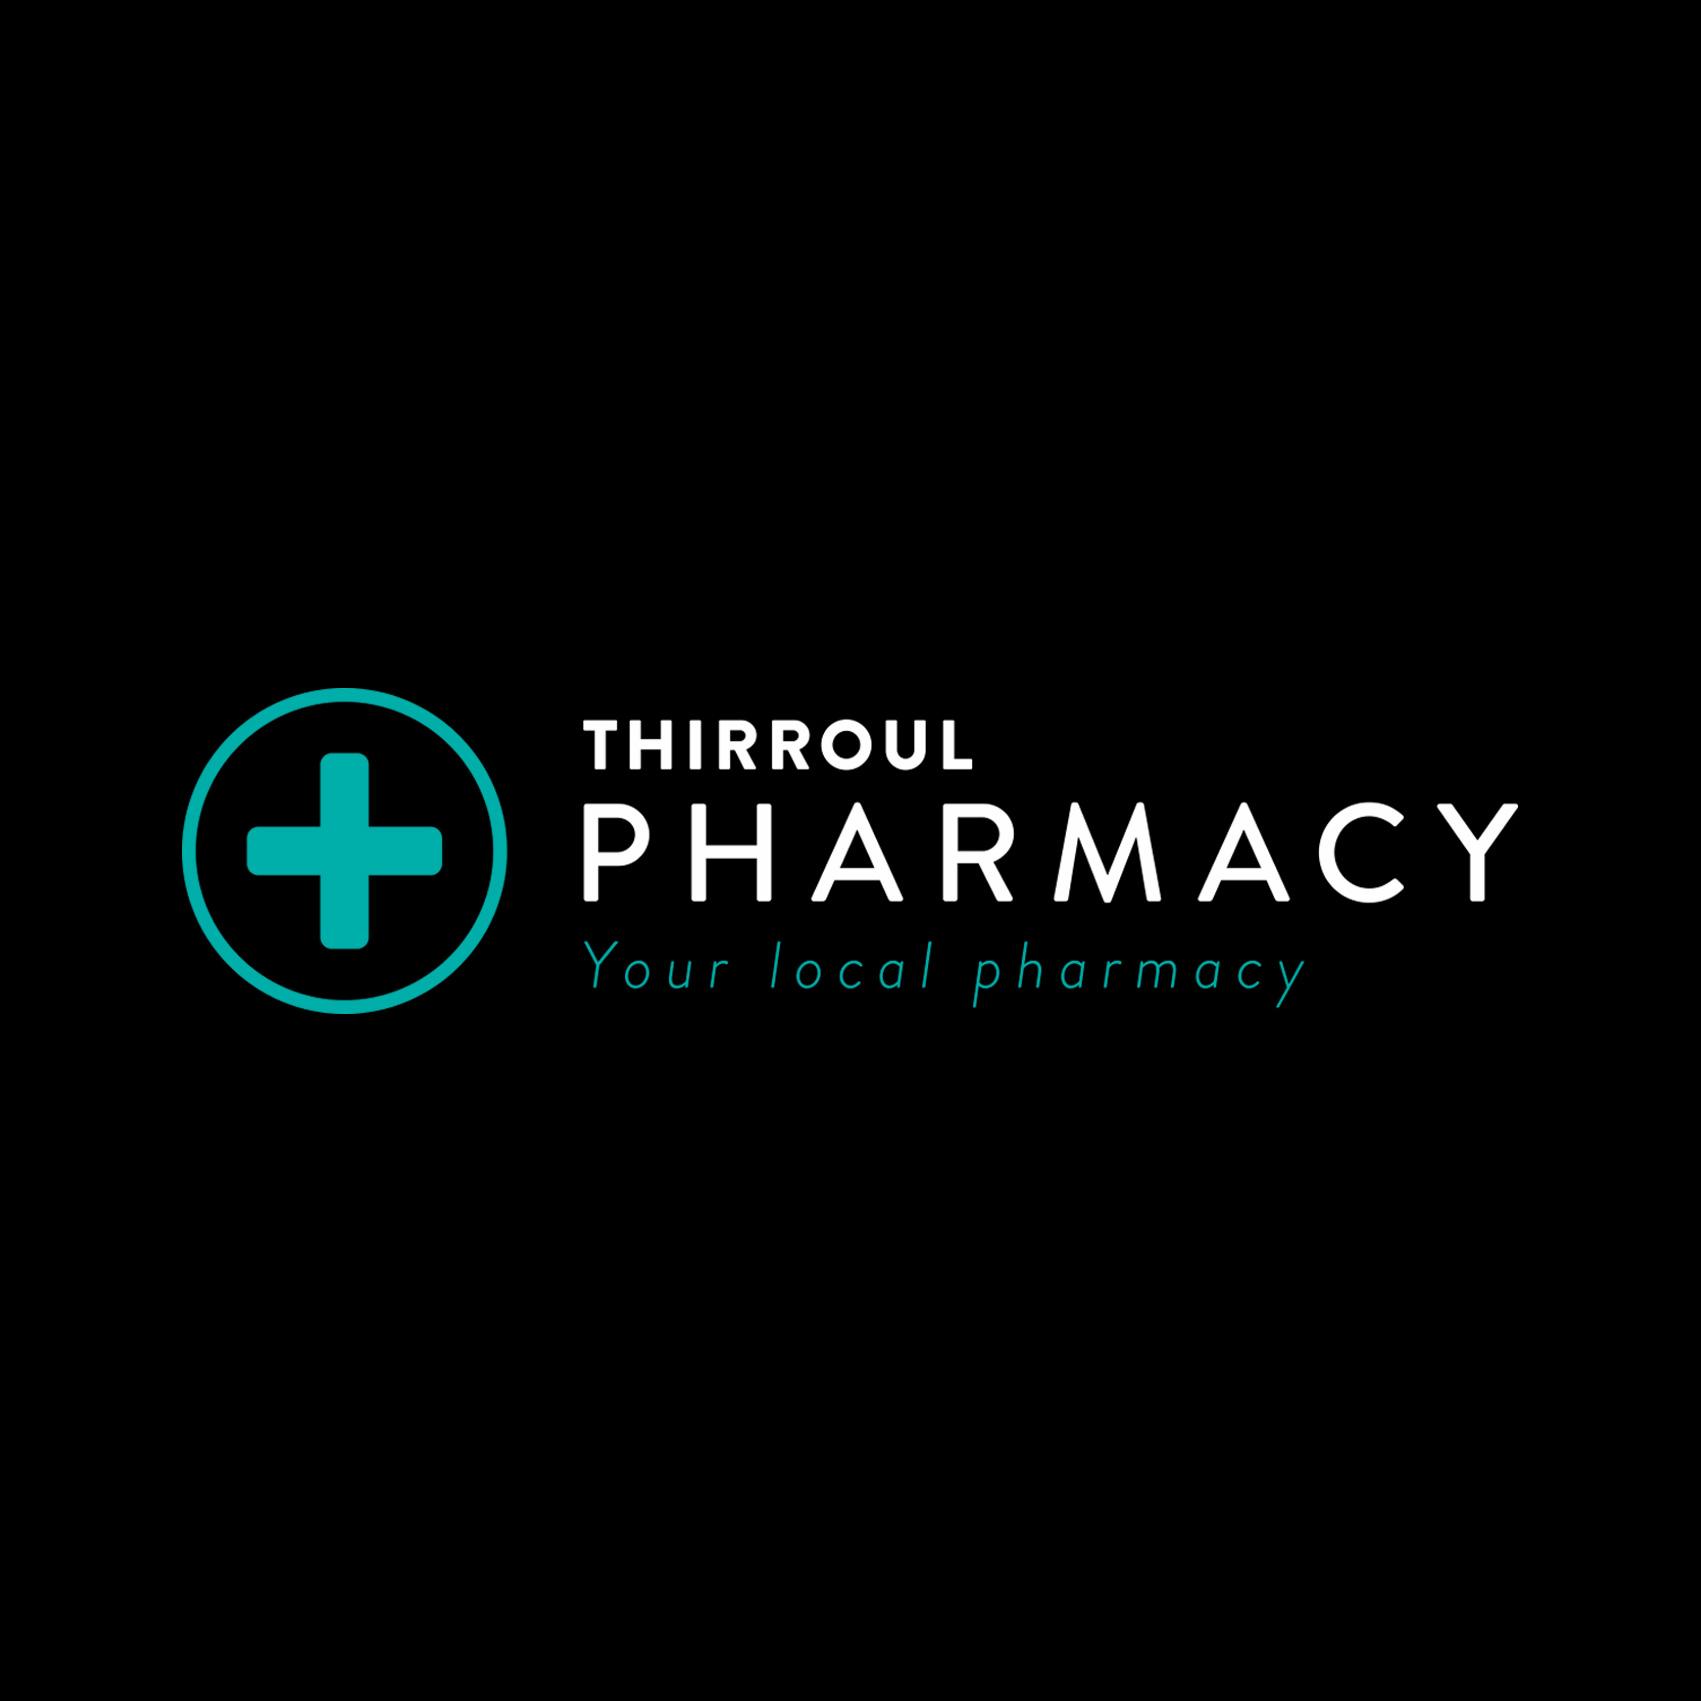 thirroul-pharmacy-rebrand-wollongong-signs.jpg